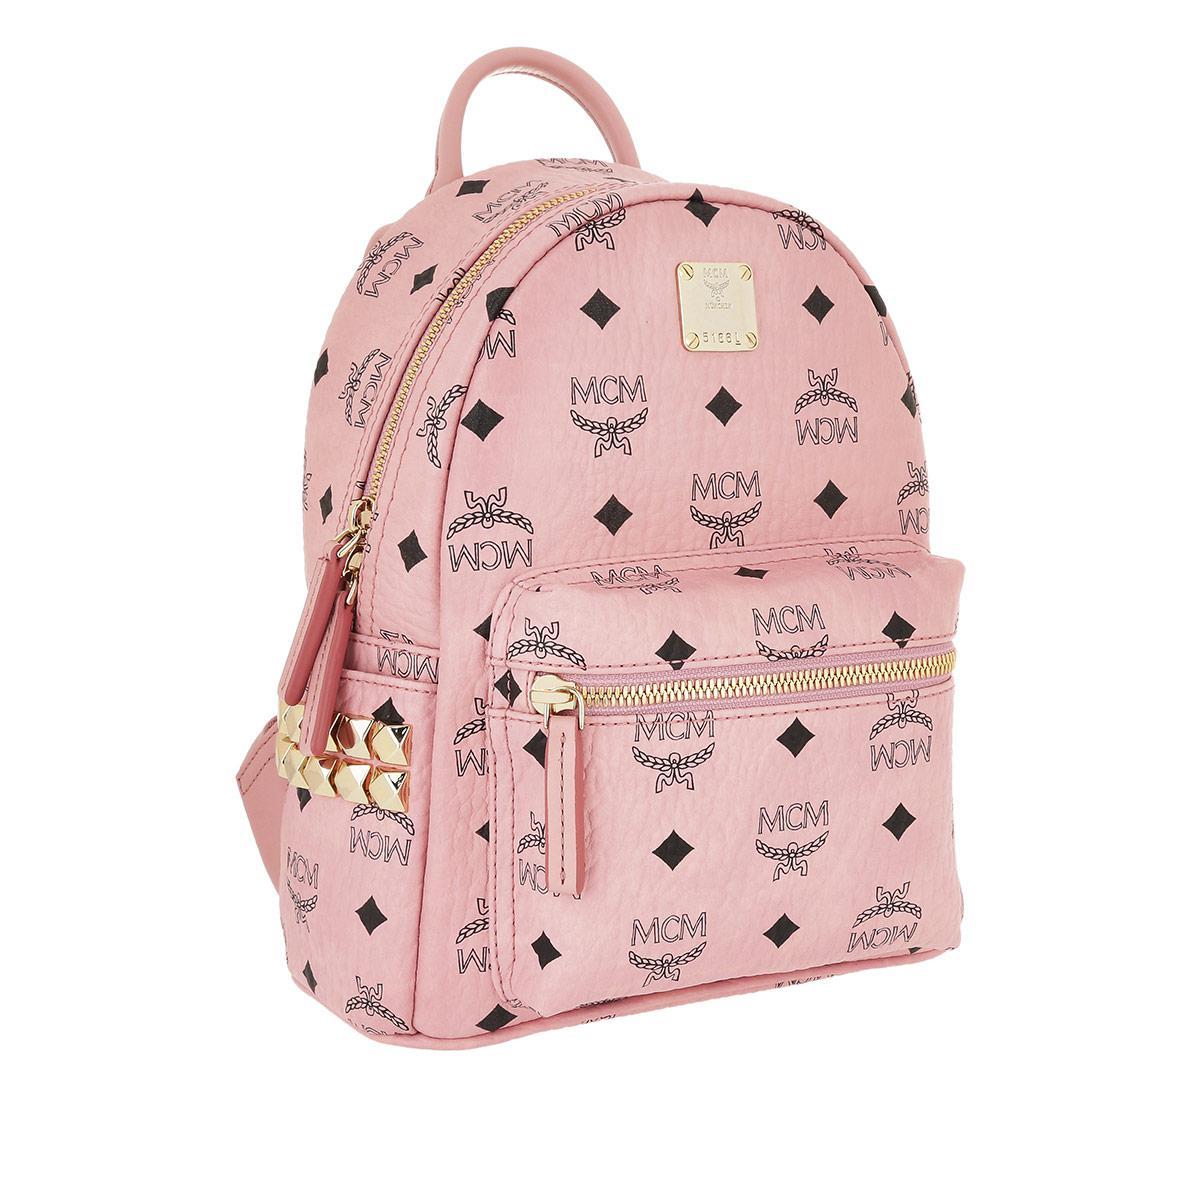 Mcm Stark Backpack Mini Soft Pink Lyst View Fullscreen